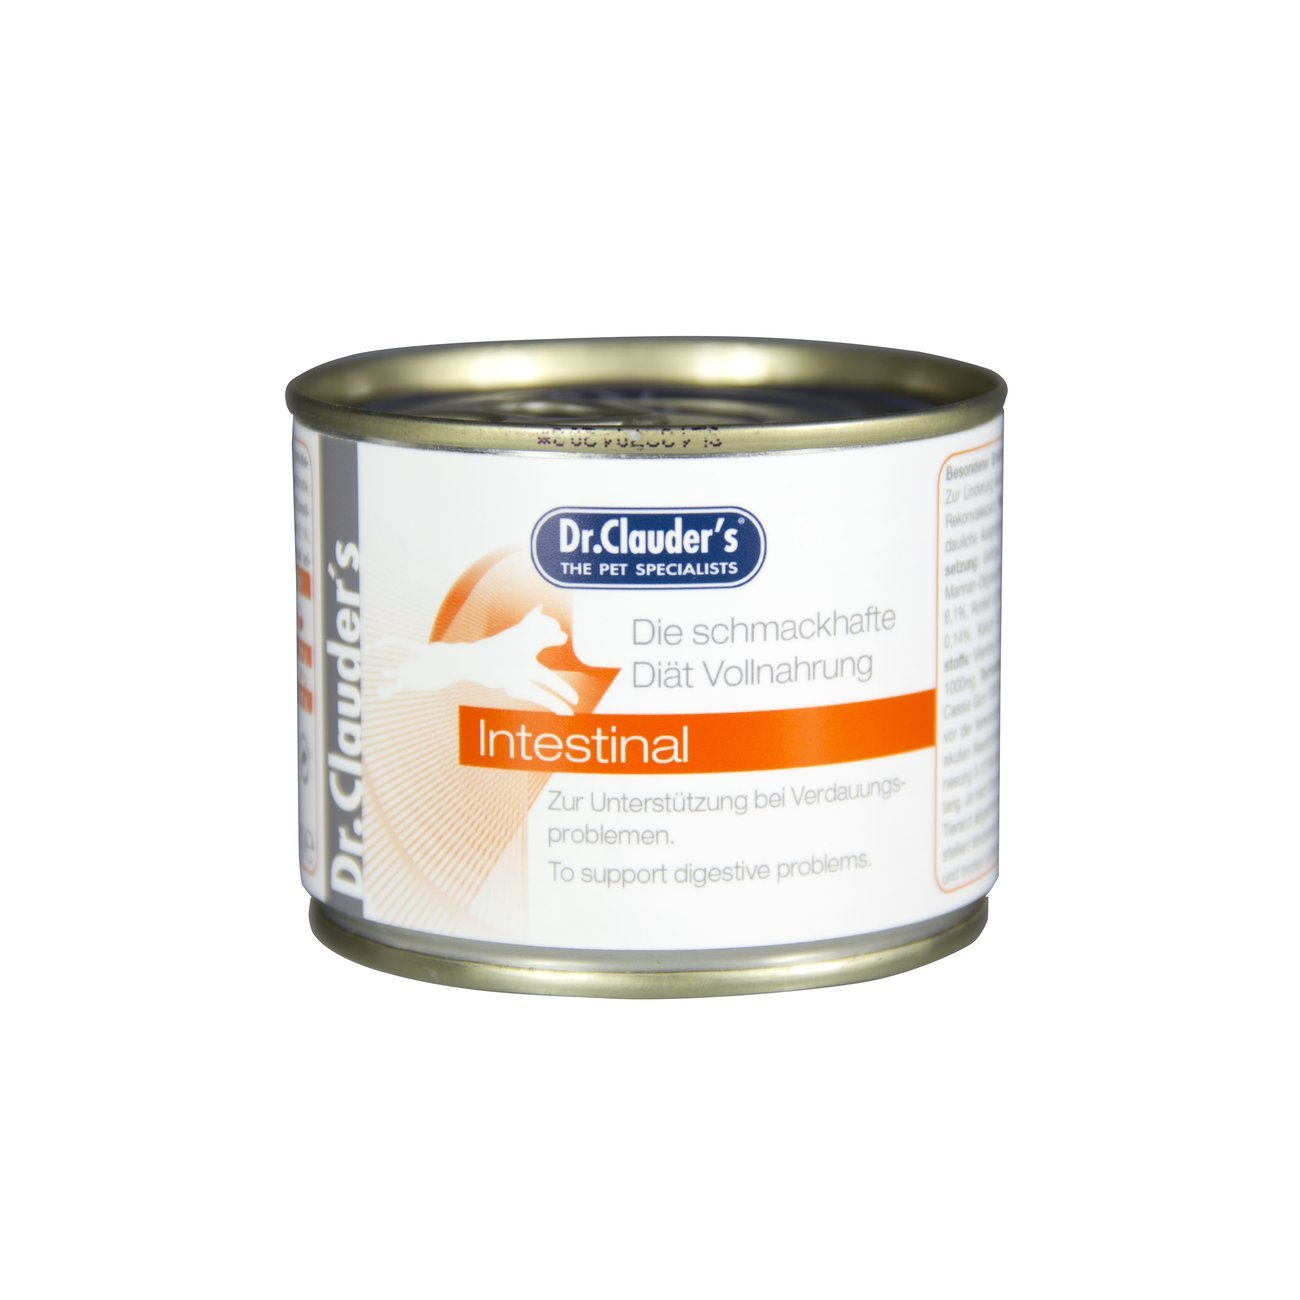 Dr. Clauders High Premium Diät Katzenfutter Dose Bild 3